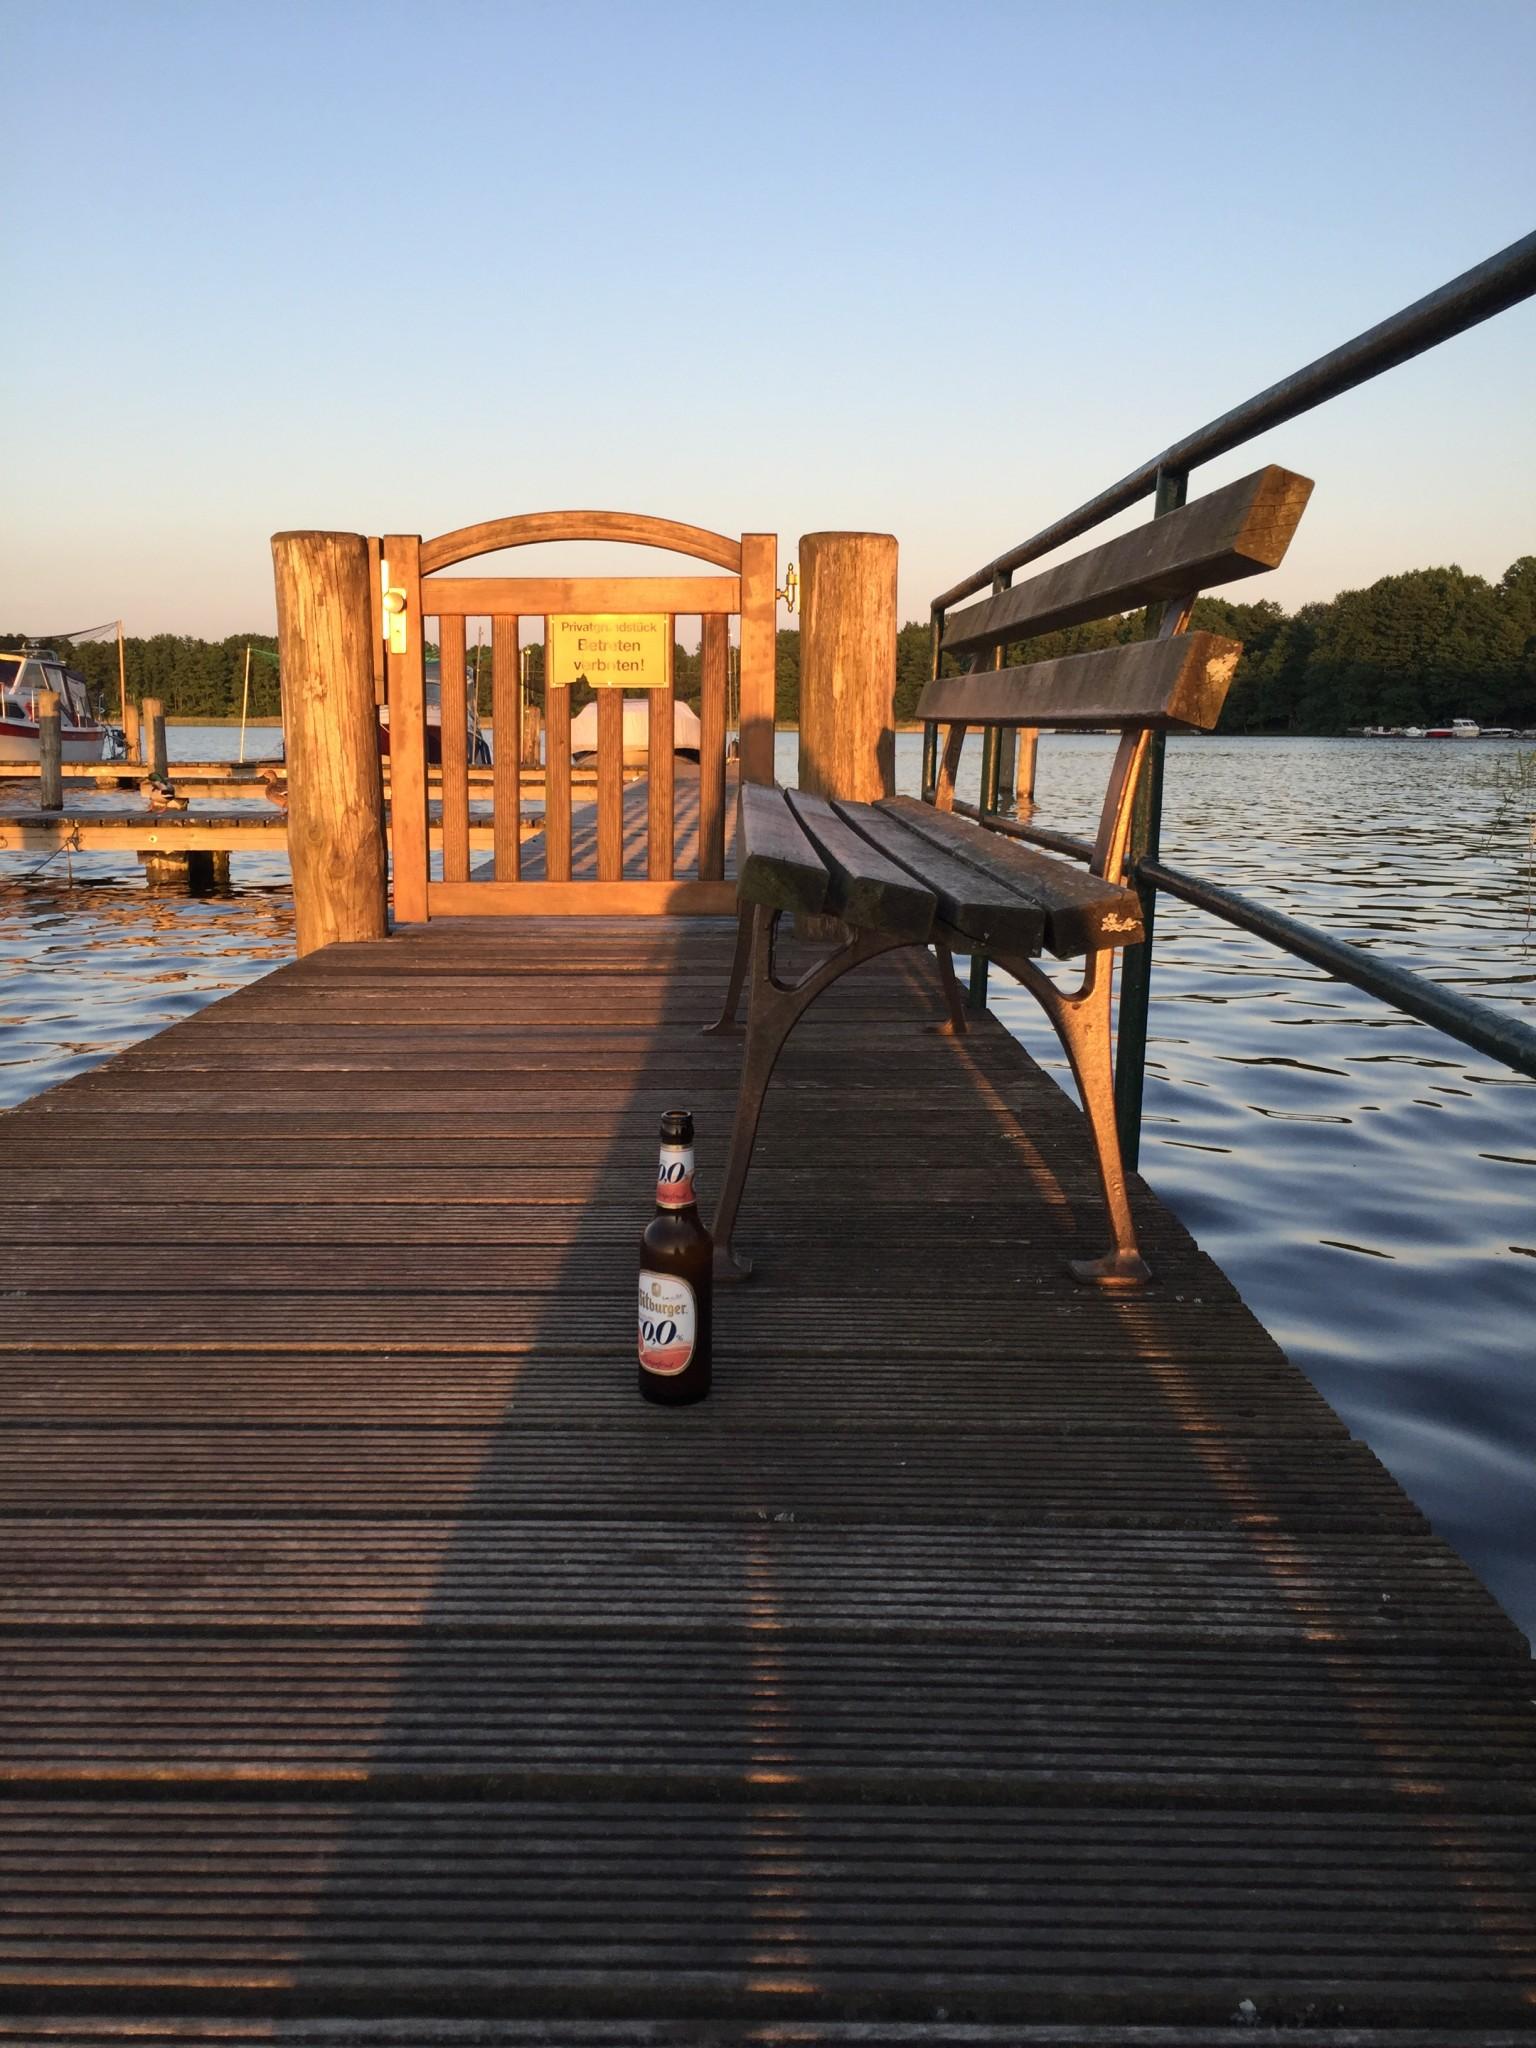 Abends am Pälitzsee im Juni 2016 am Steg